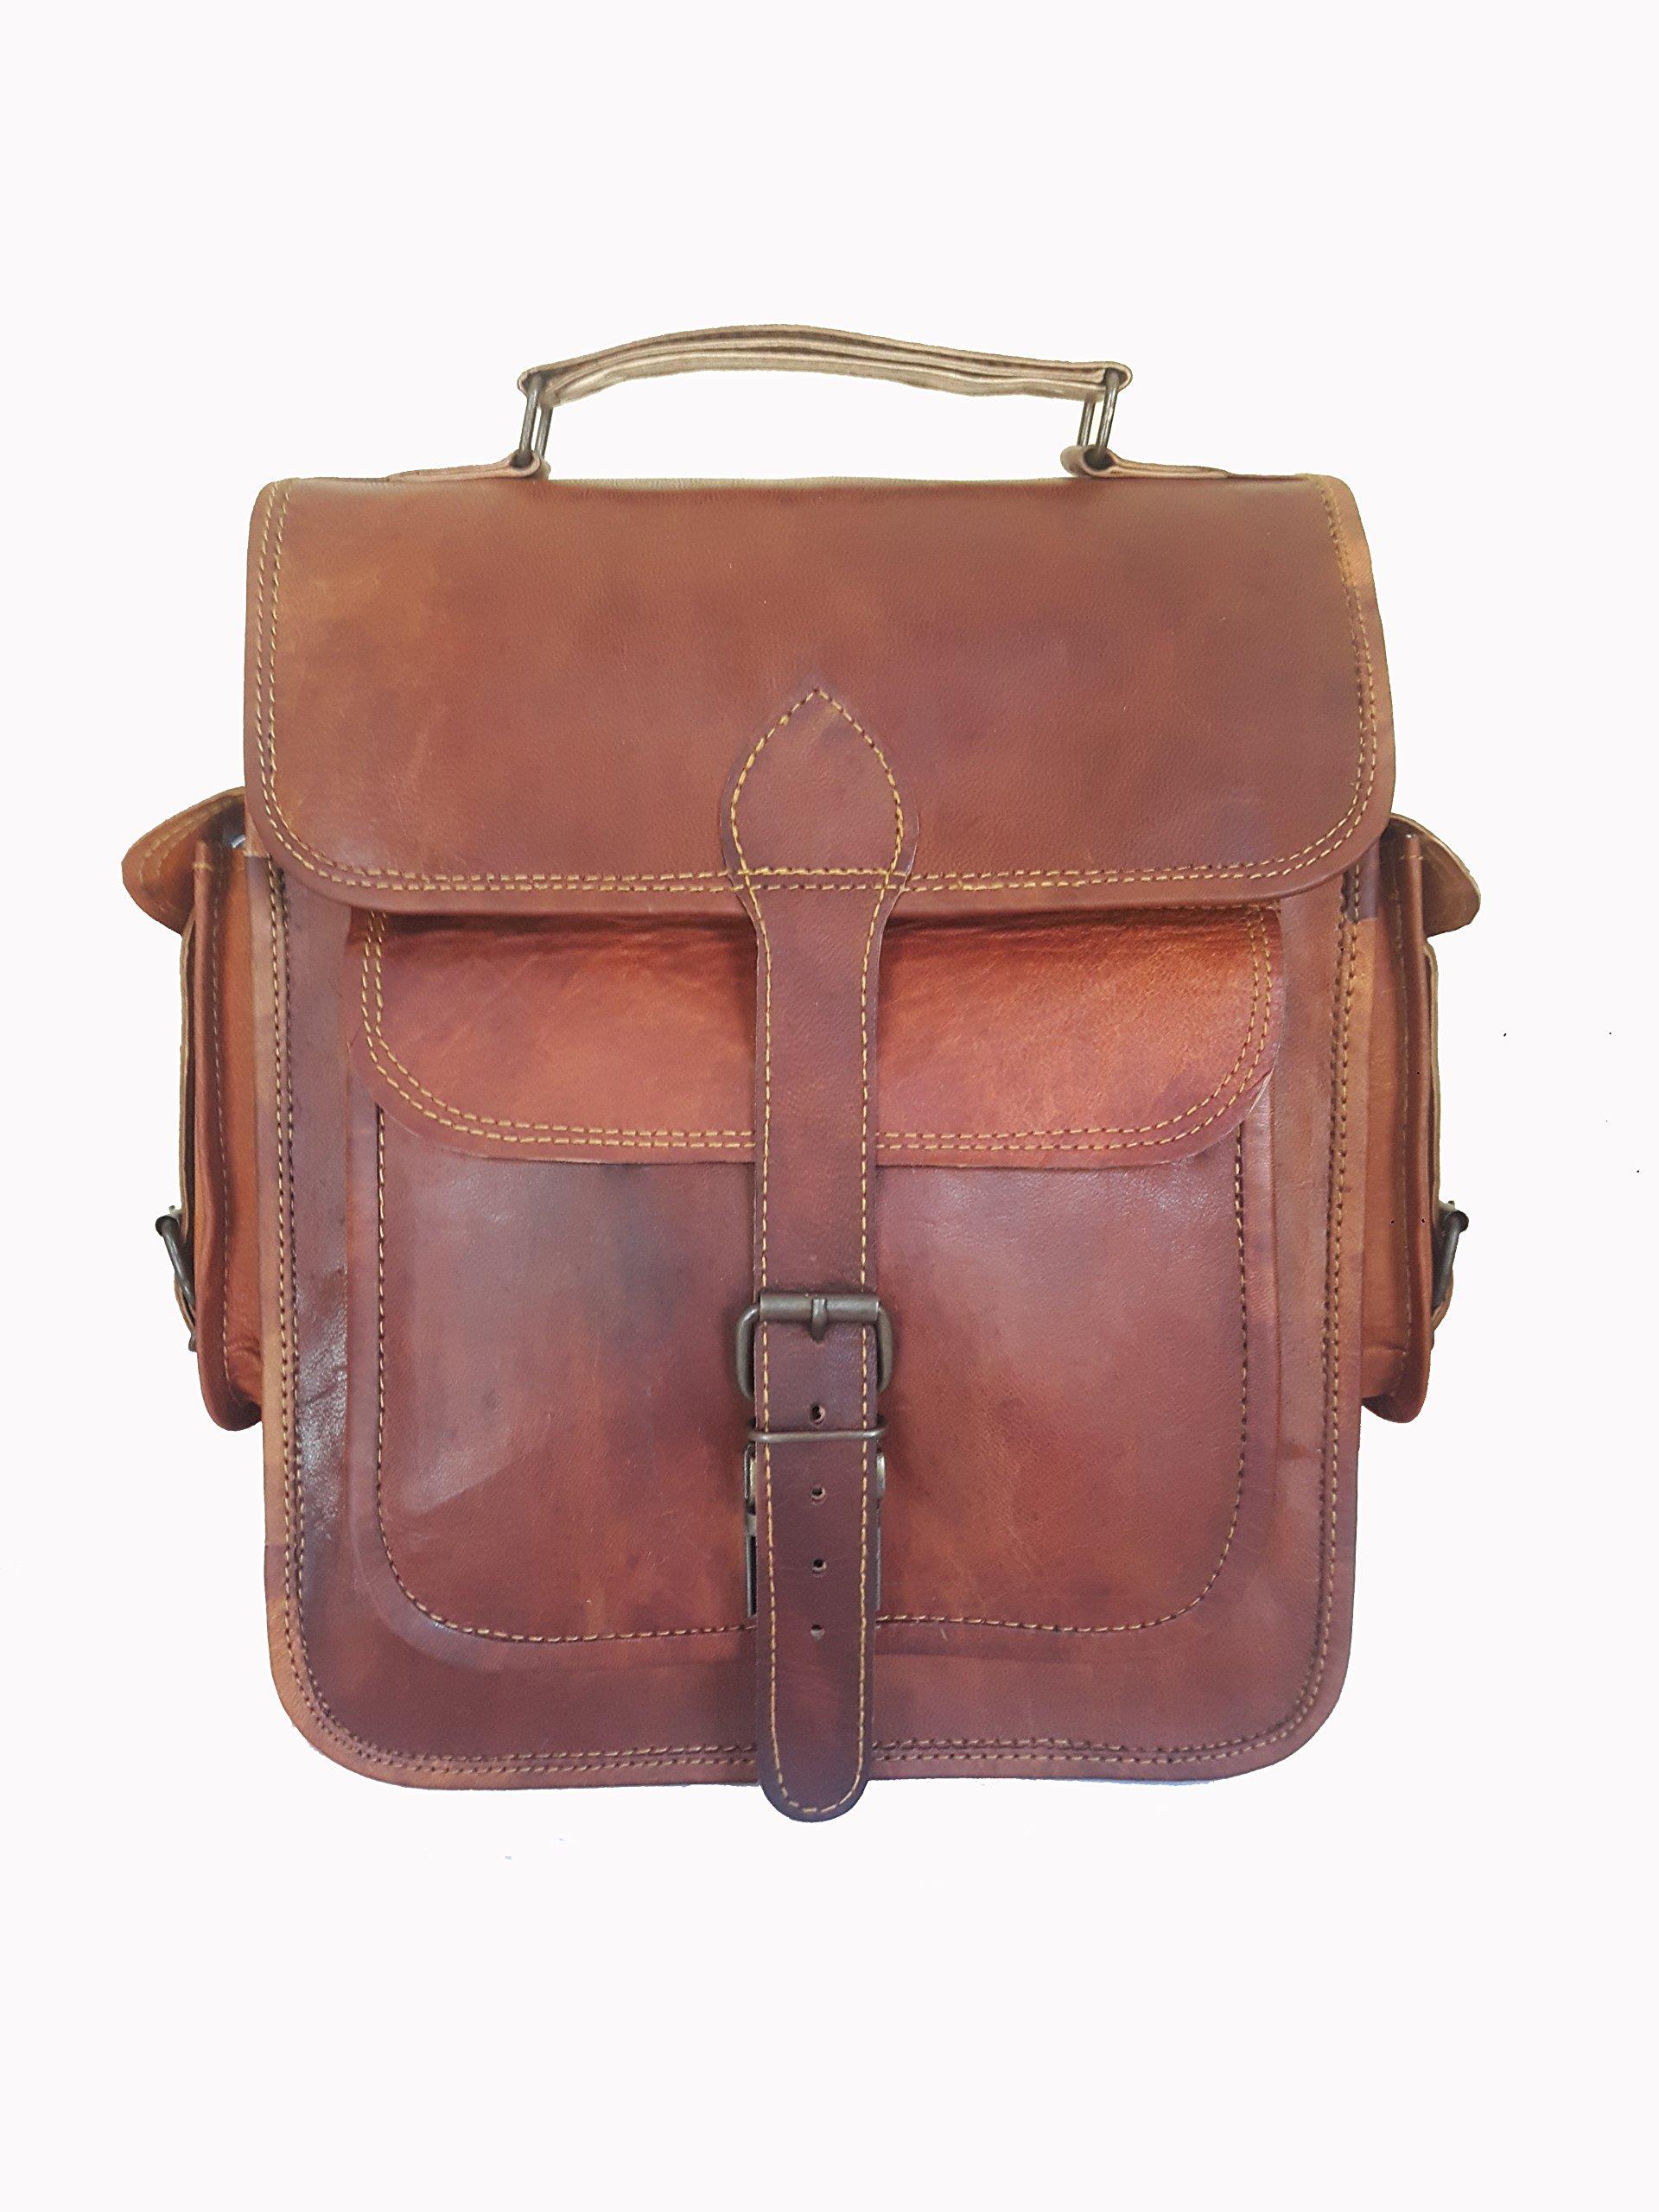 "Maison De Cuir Compatible for 12"" Handmade Vintage Leather Satchel Backpack Laptop Bag Ipad Apple"